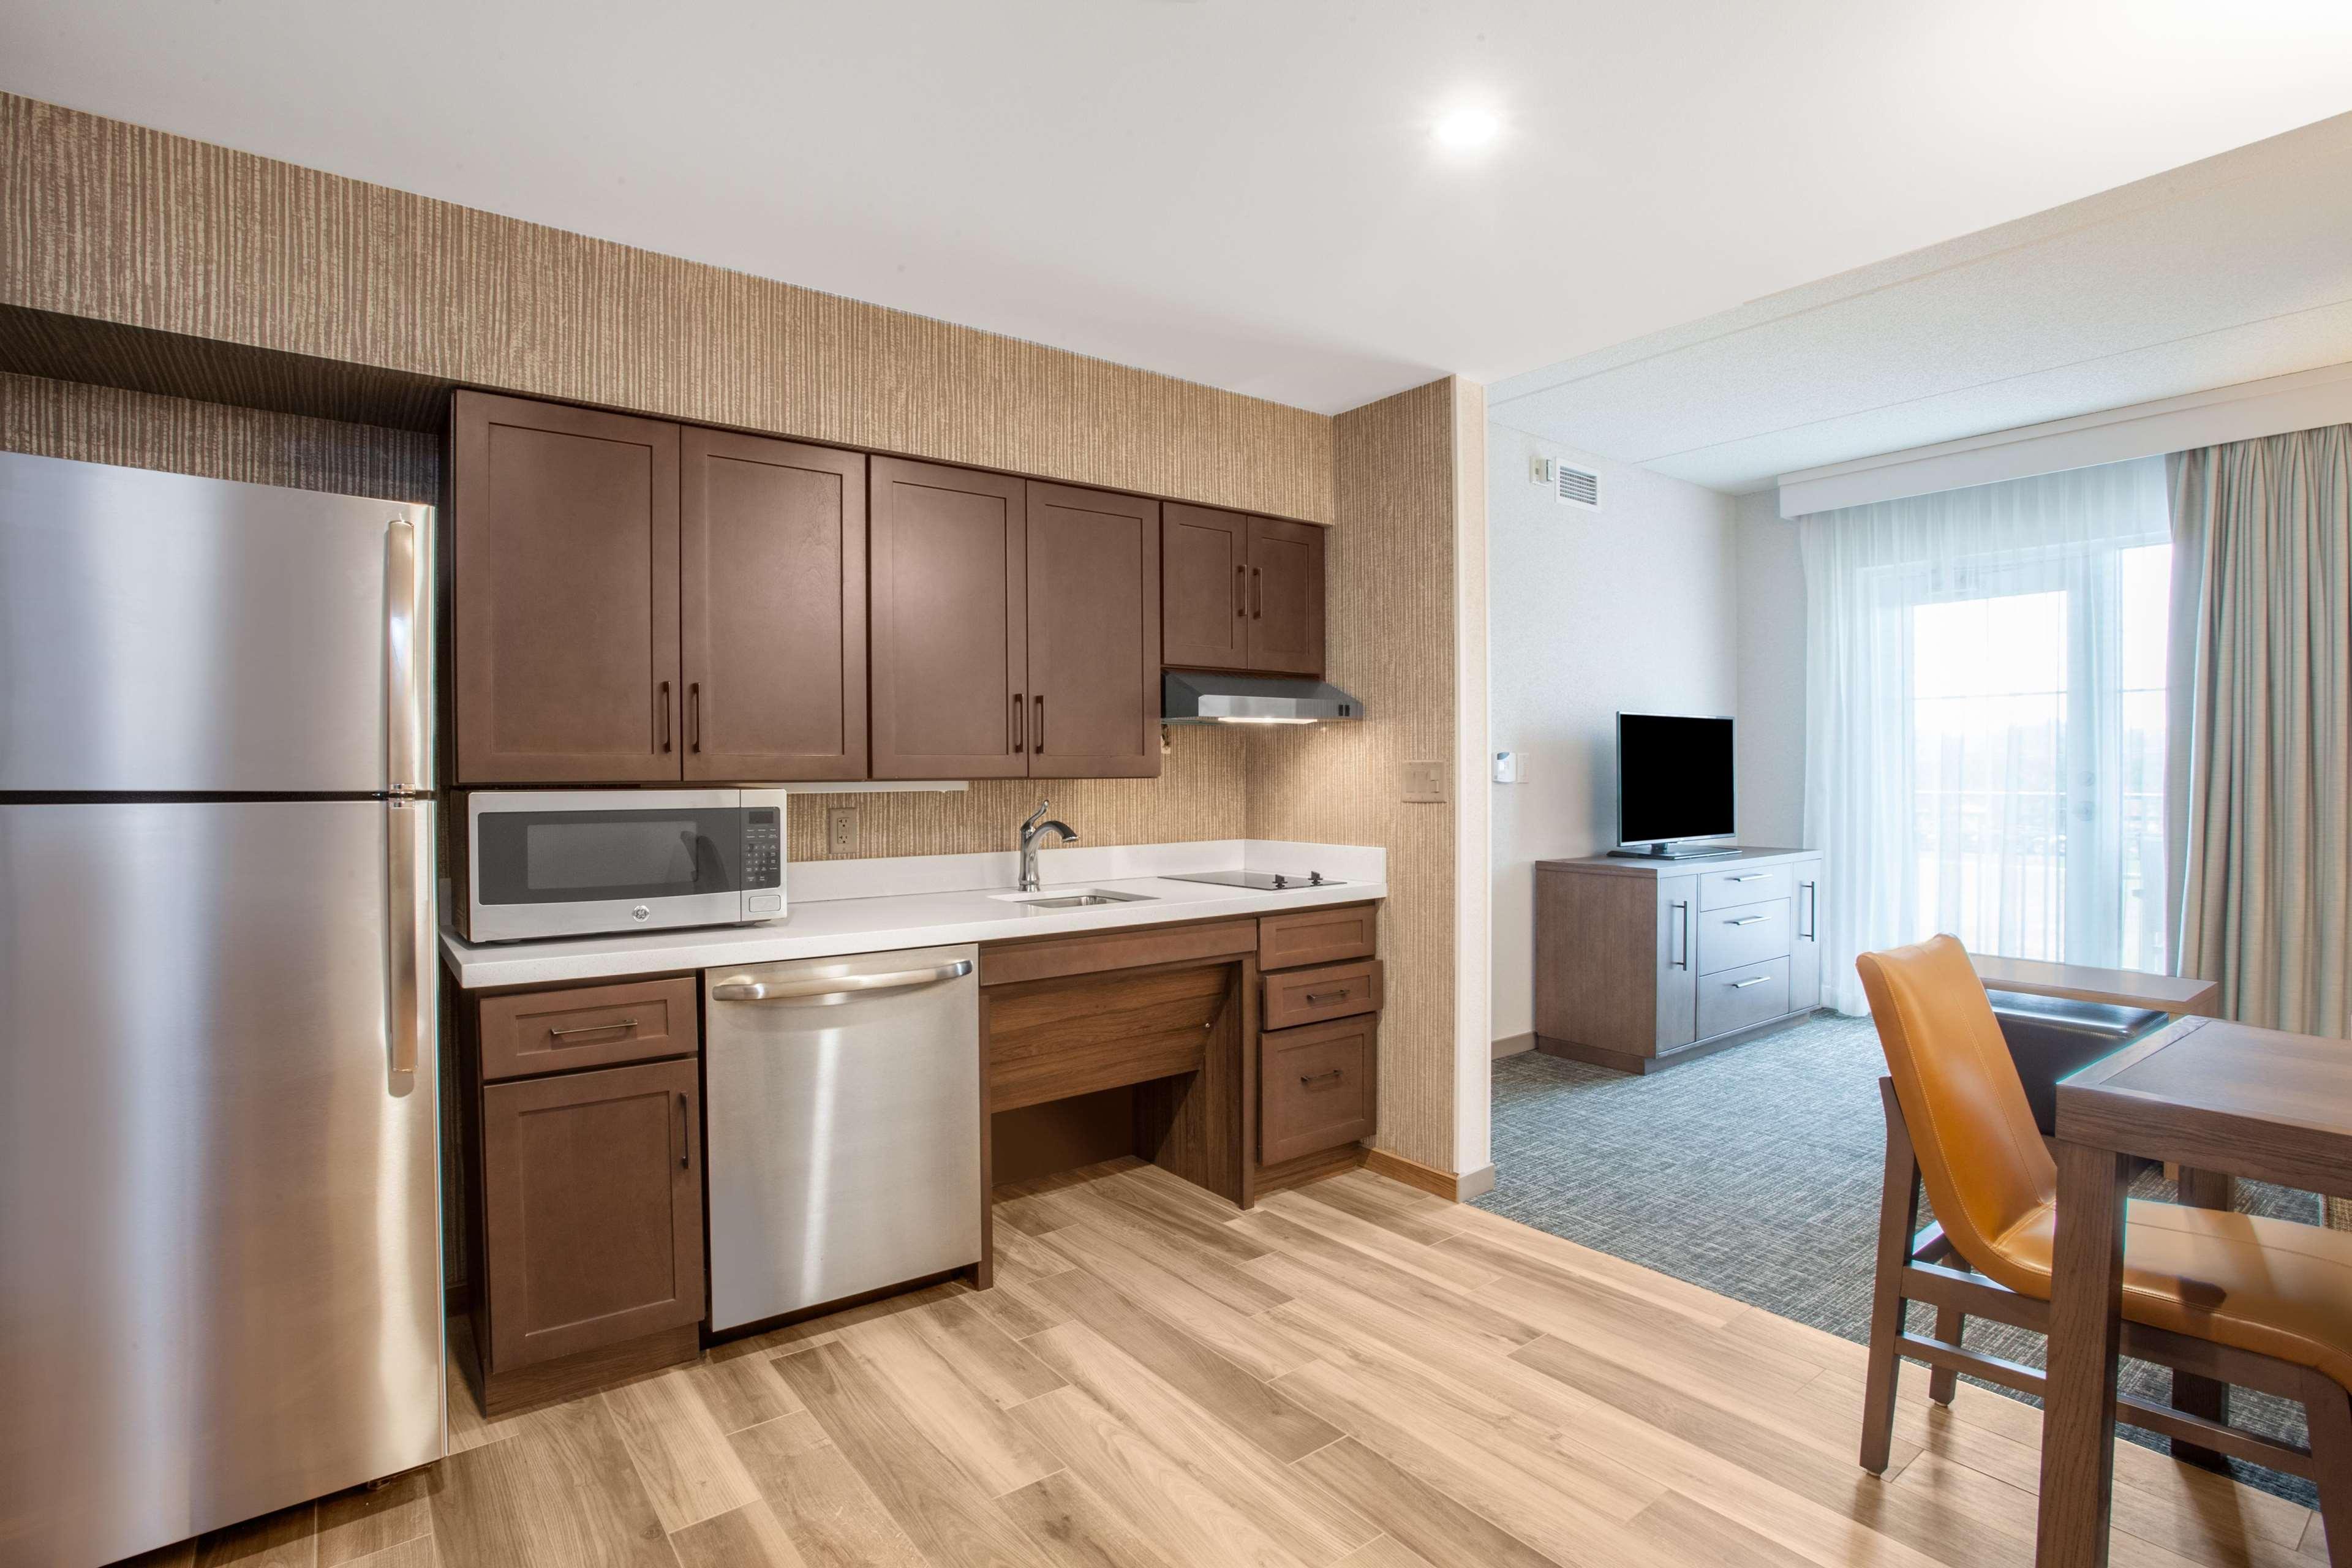 Homewood Suites by Hilton Saratoga Springs image 38